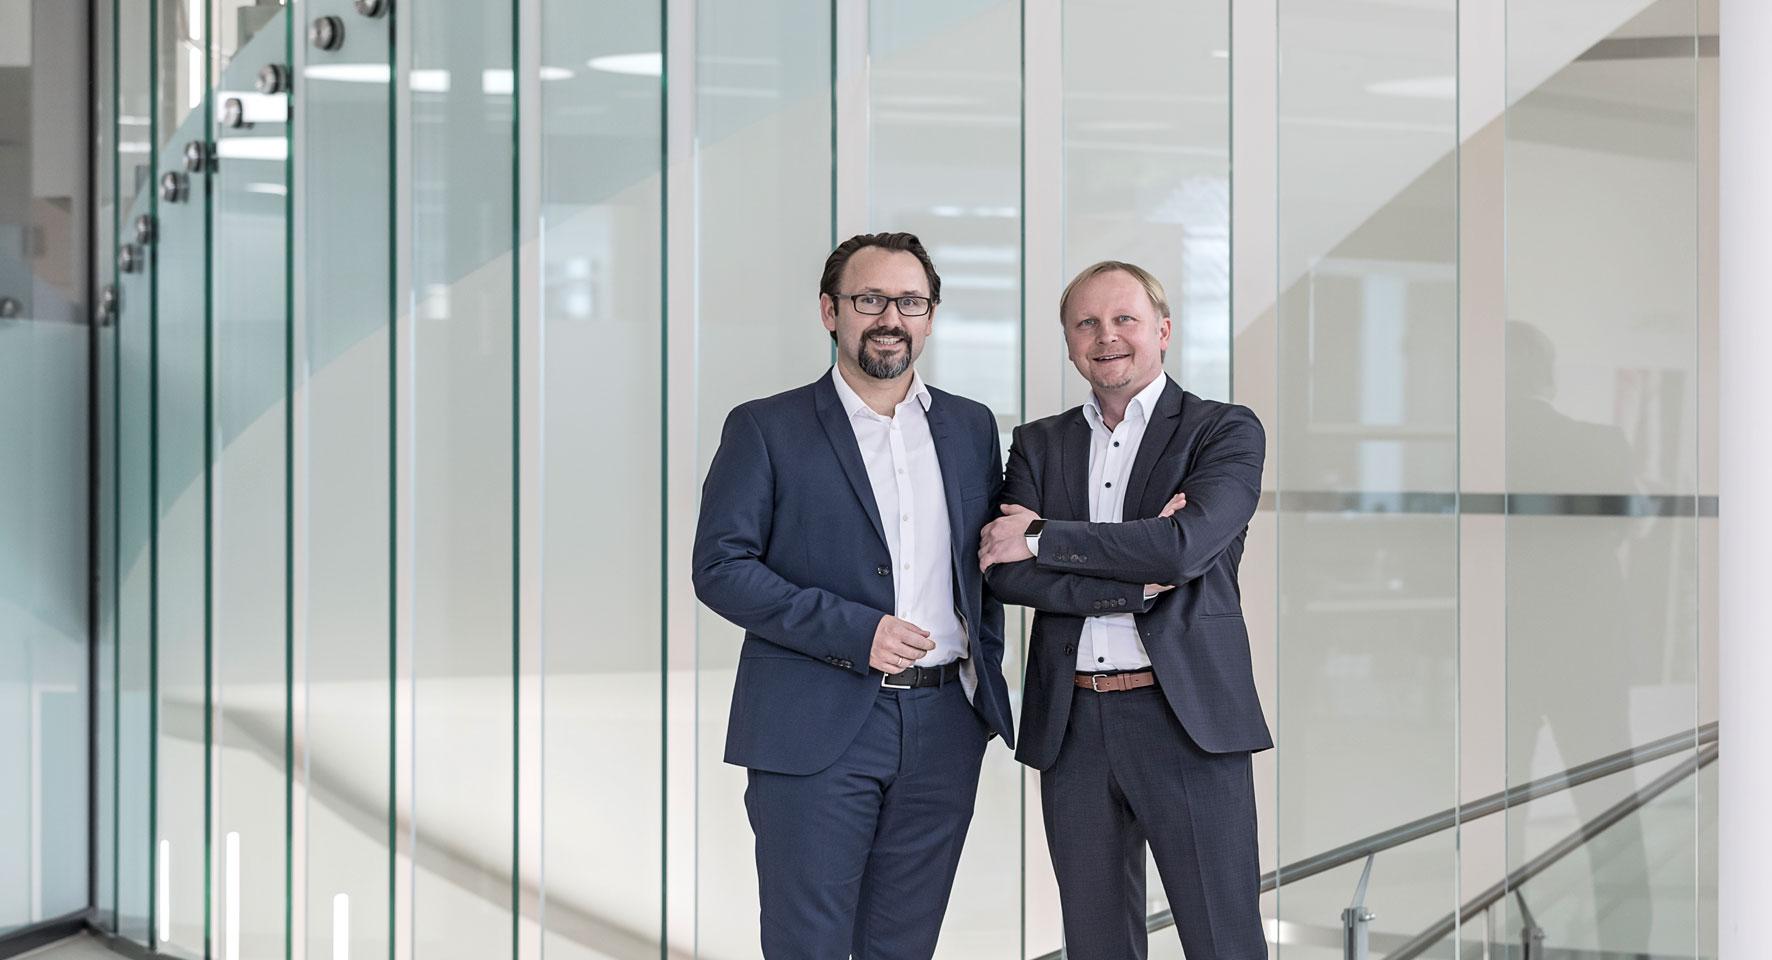 Unternehmen RRZ Geschäftsführer Ulfried Paier, Dietmar Schlar